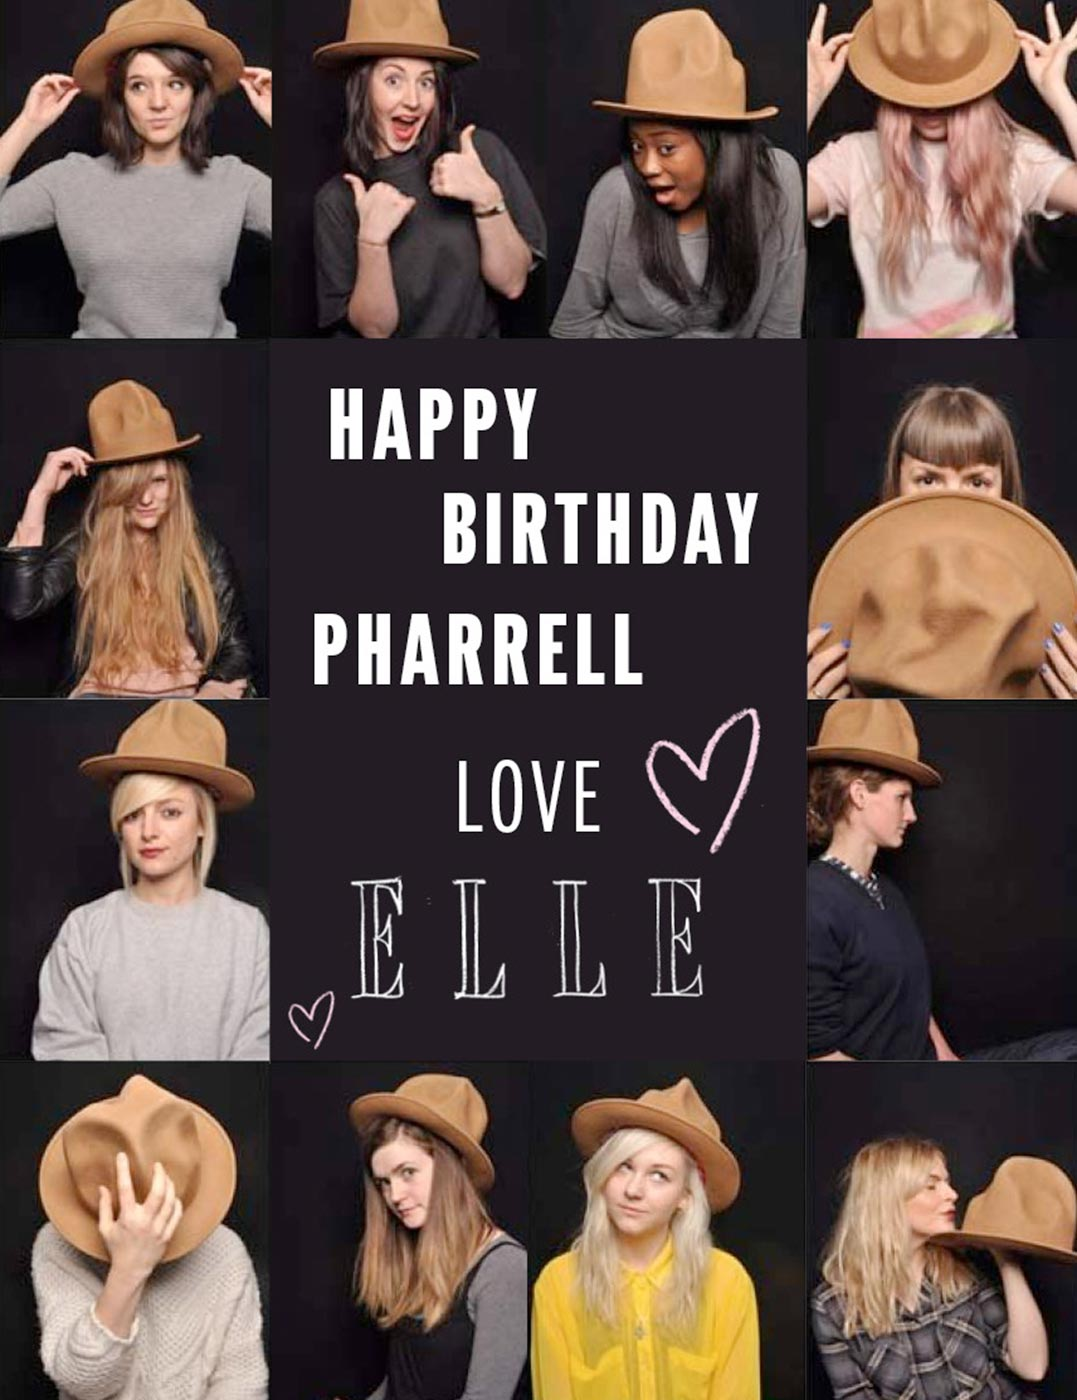 happy birthday pharrell